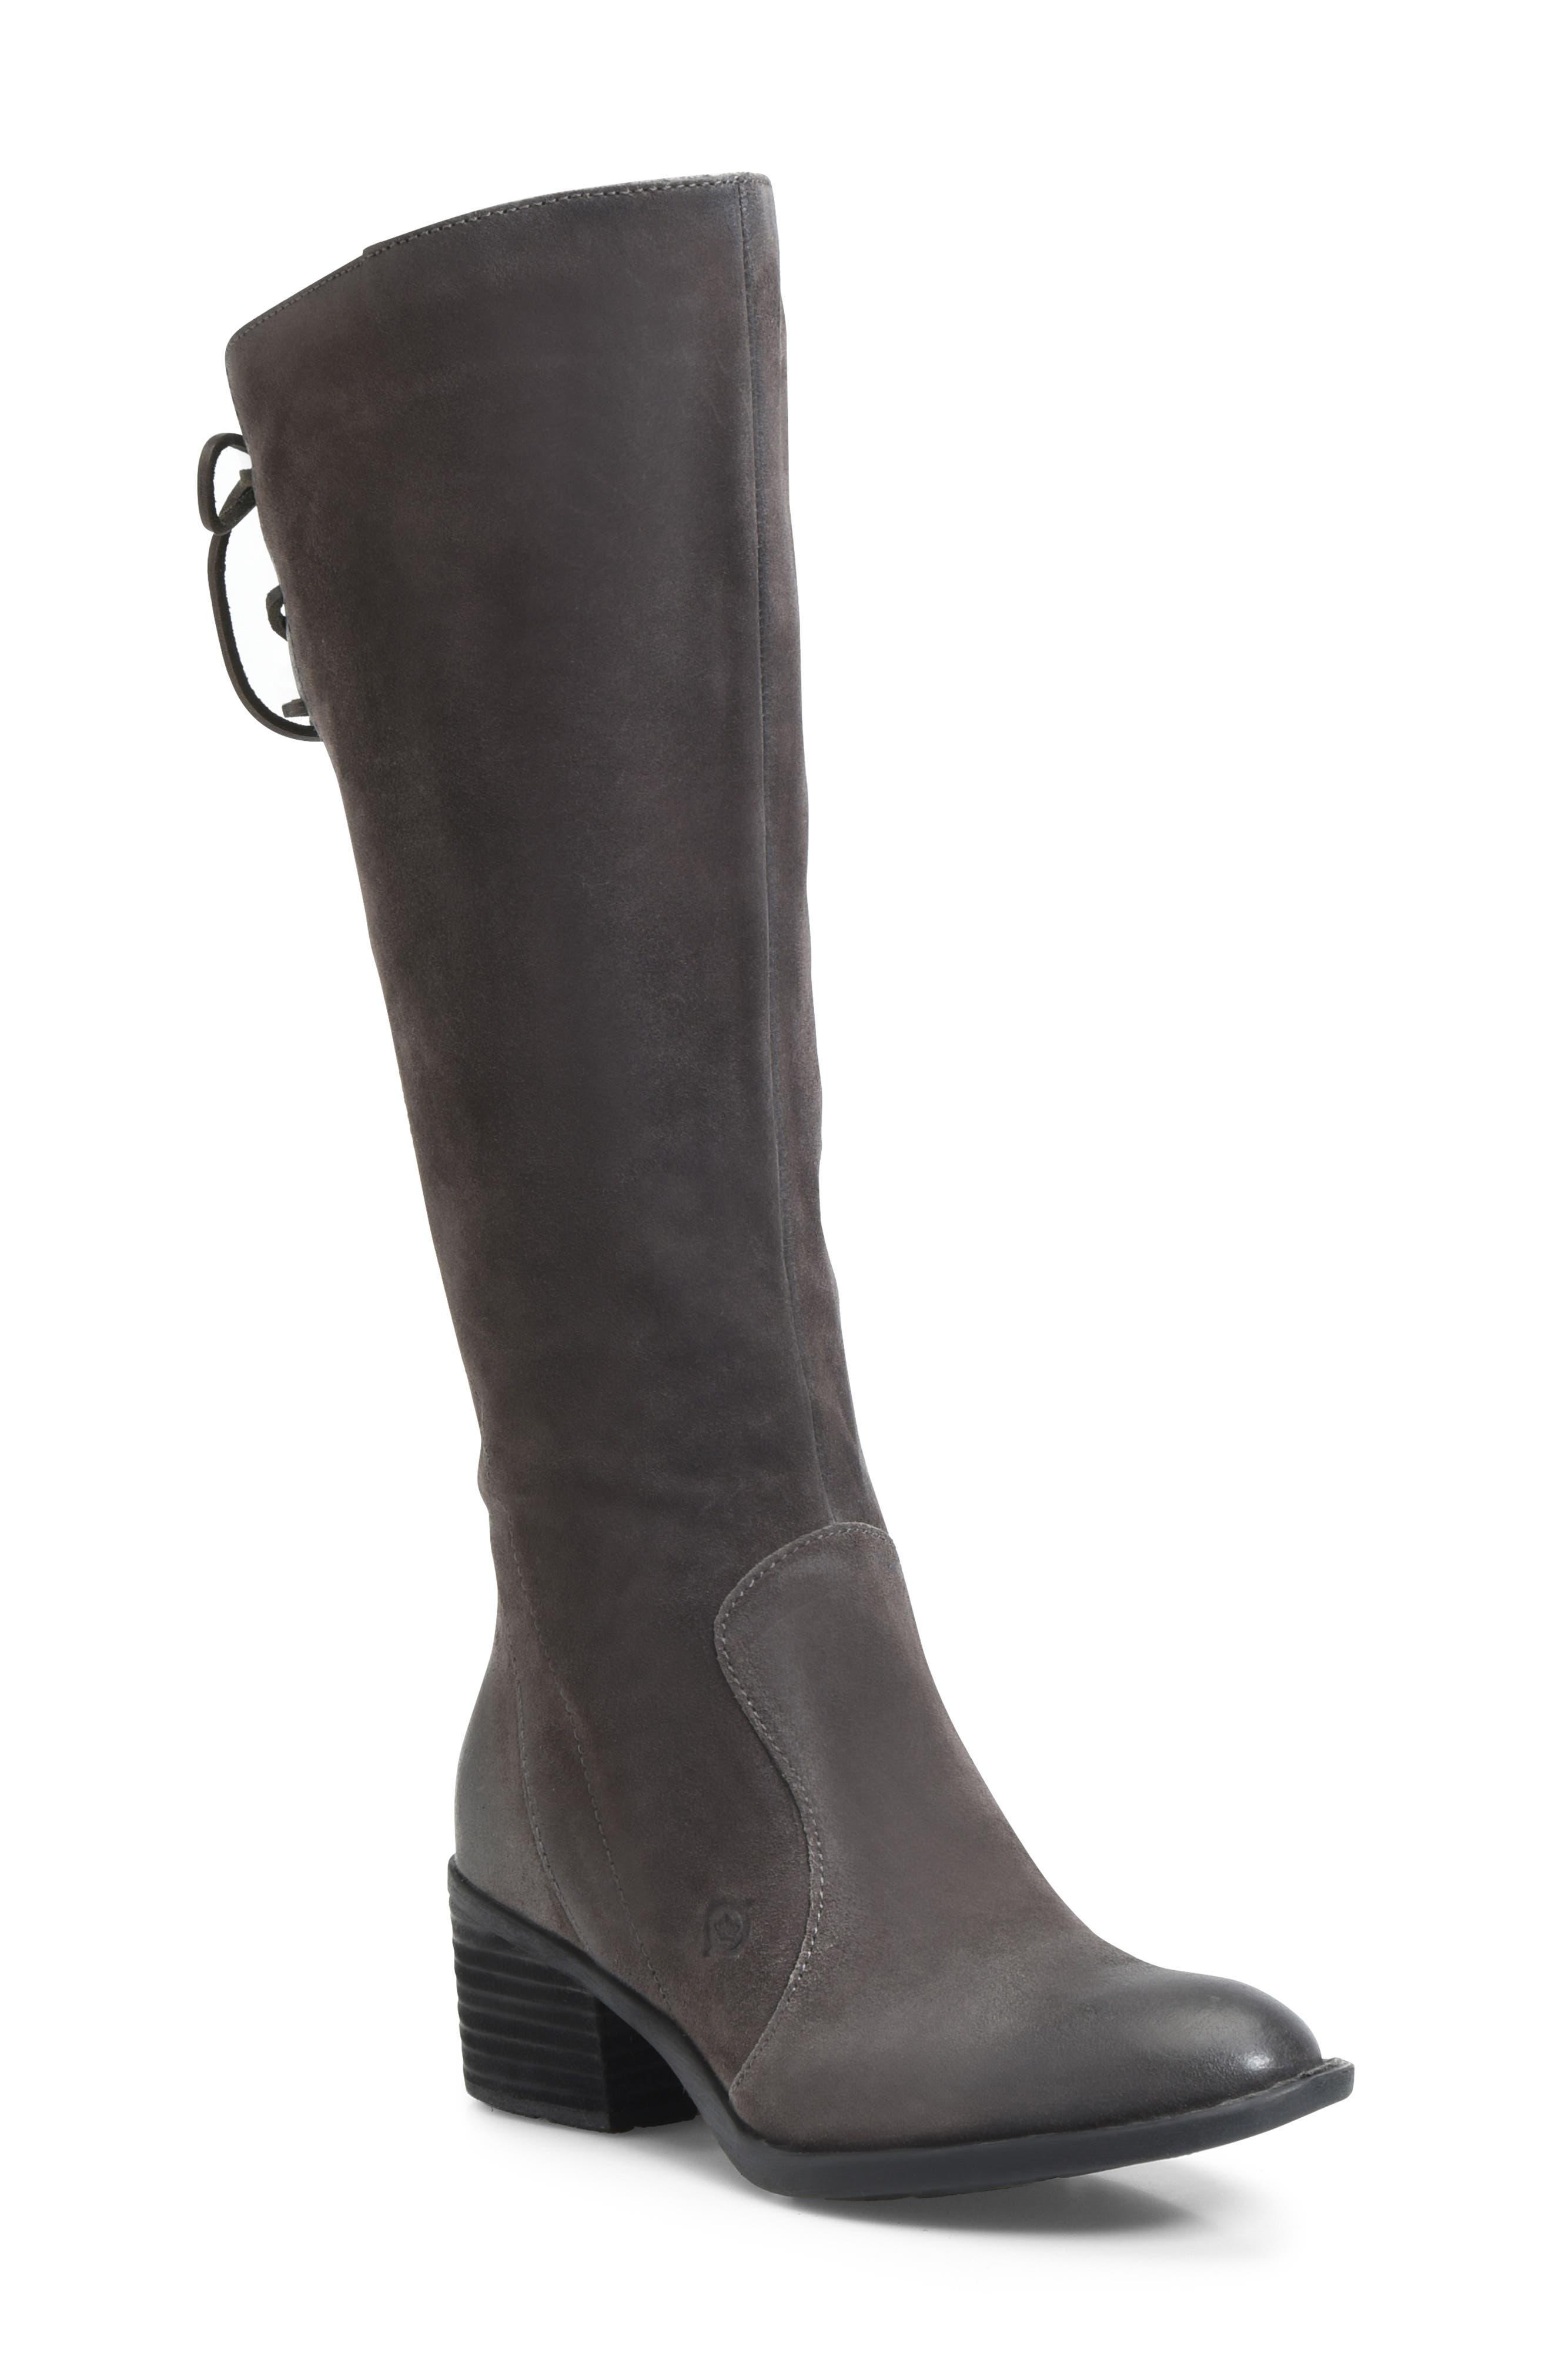 BØRN Felicia Knee High Boot, Main, color, 021